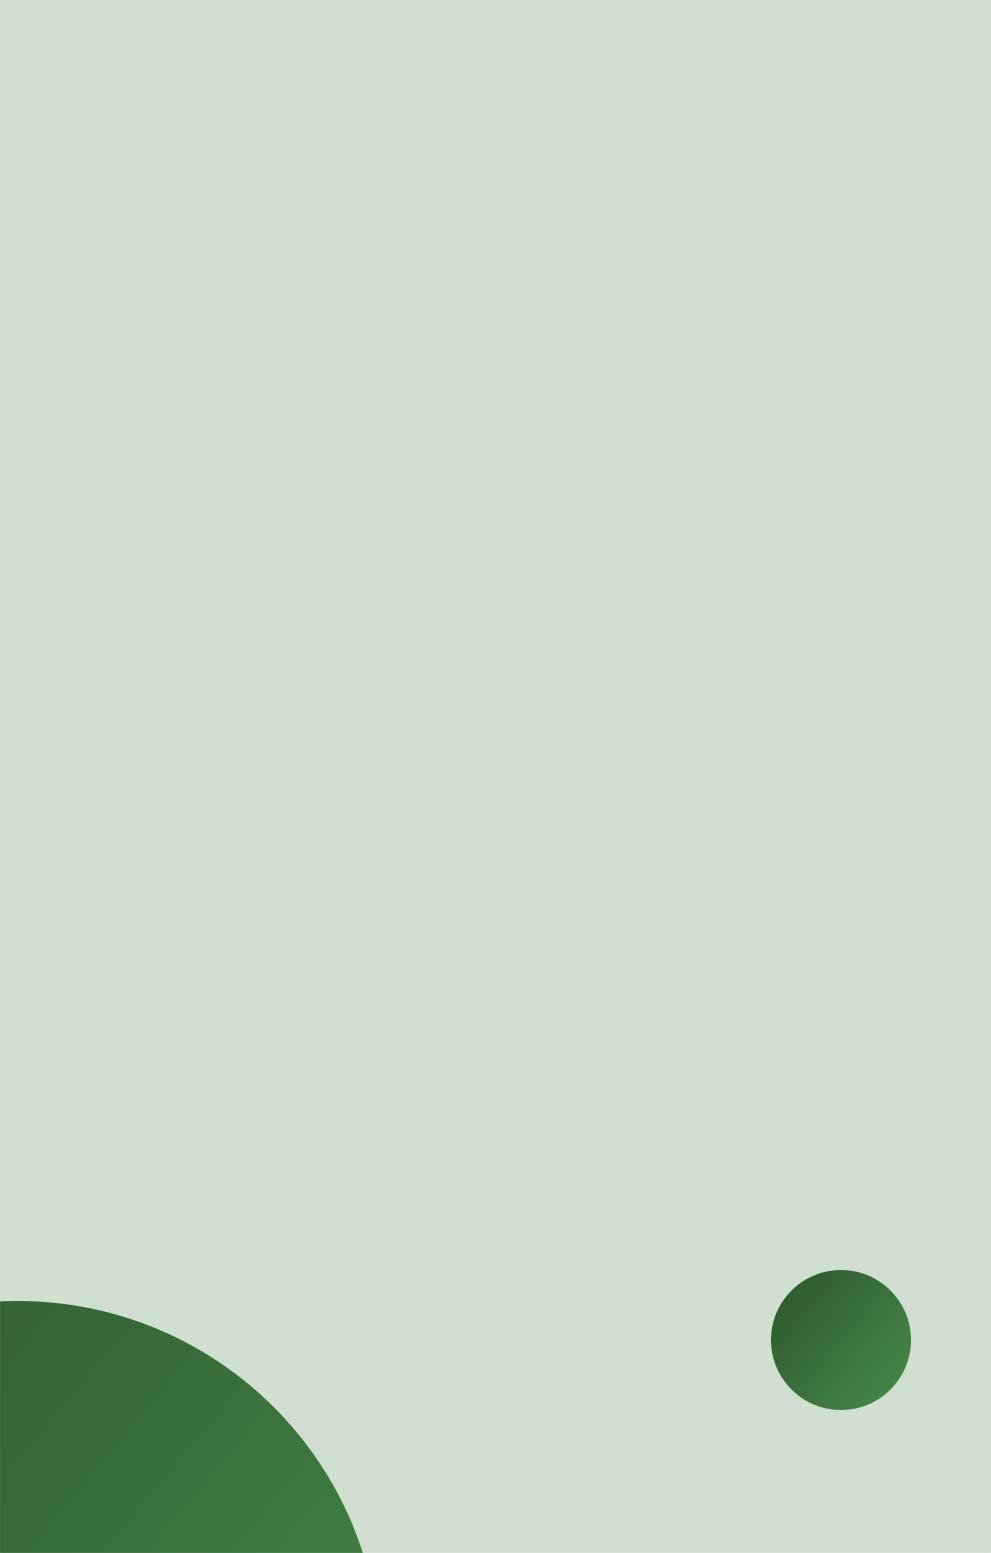 Green artwork.